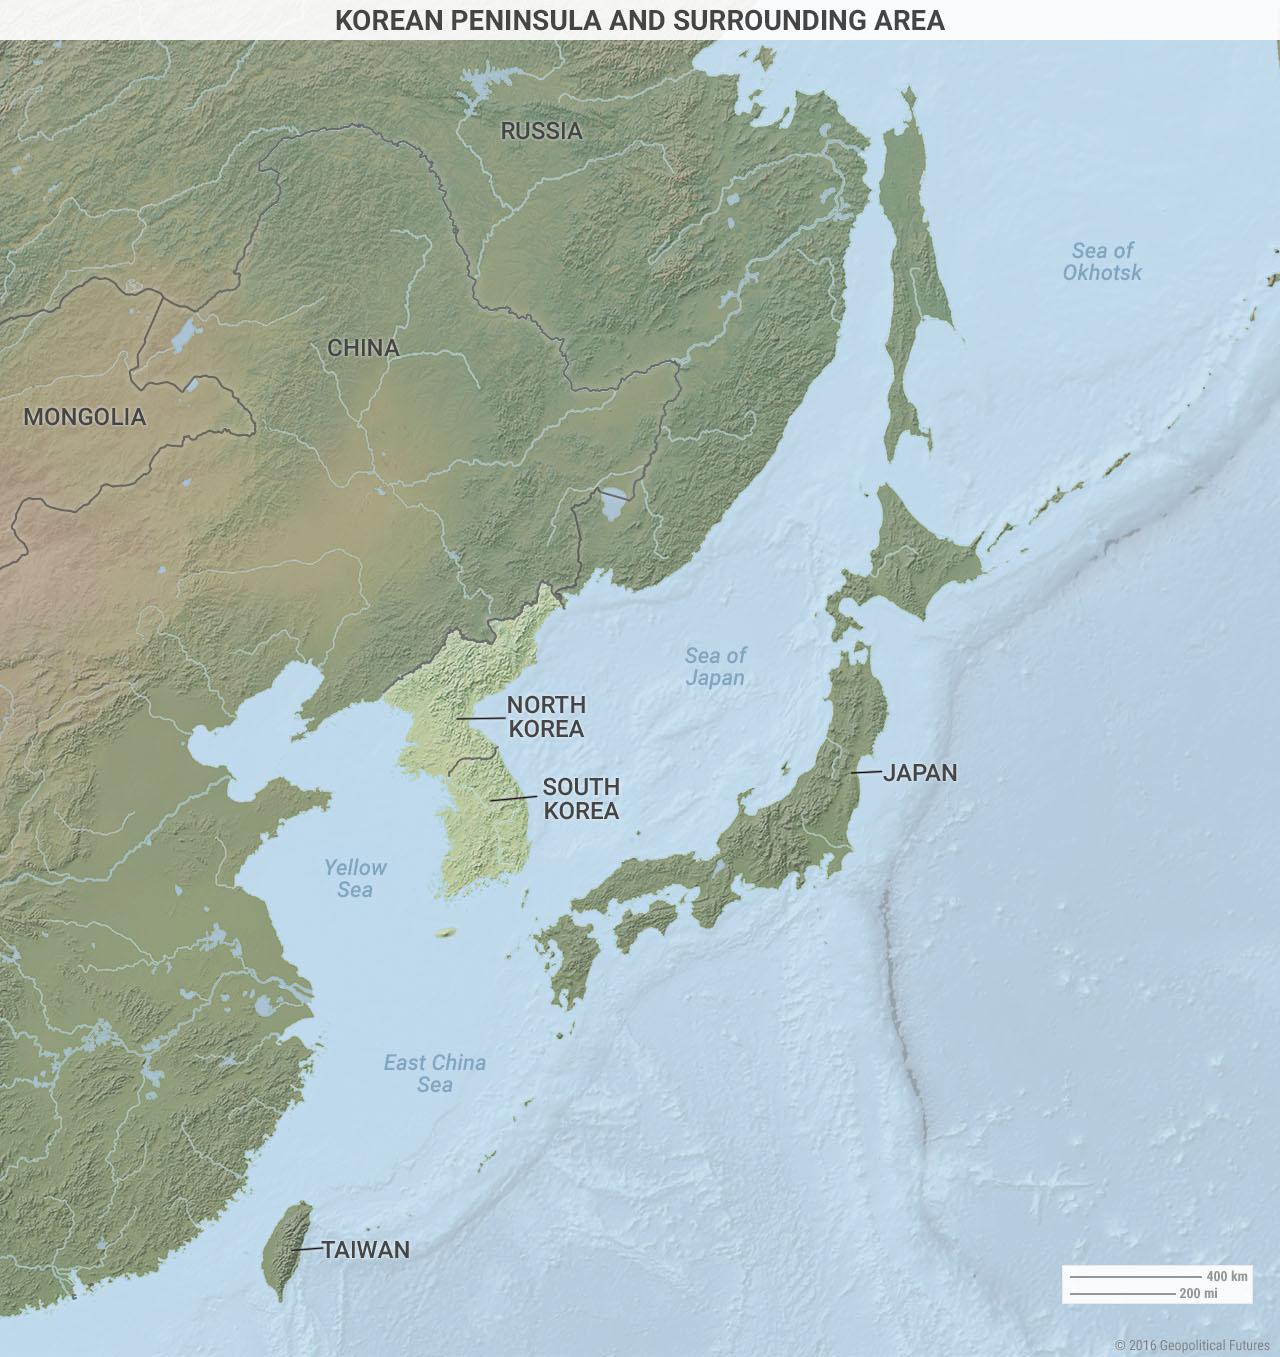 korean-peninsula-surrounding-area